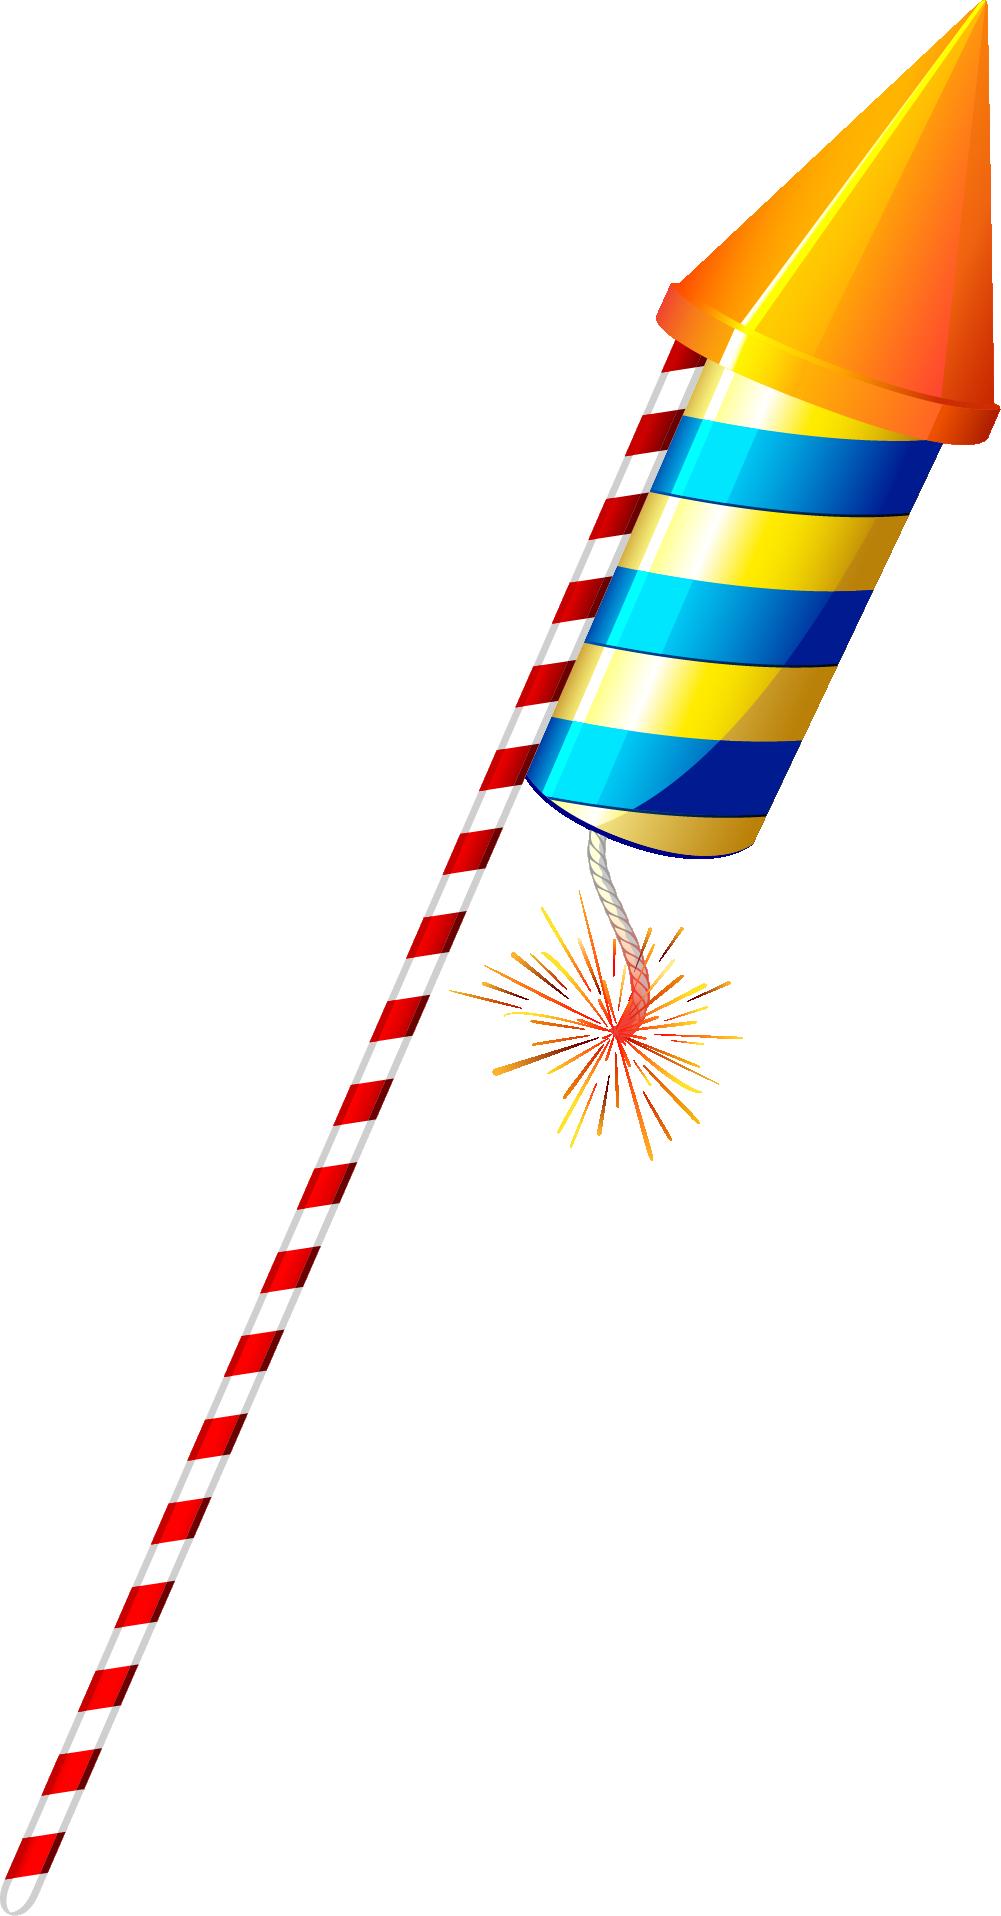 Sparkler fireworks clip art. Firecracker clipart diwali